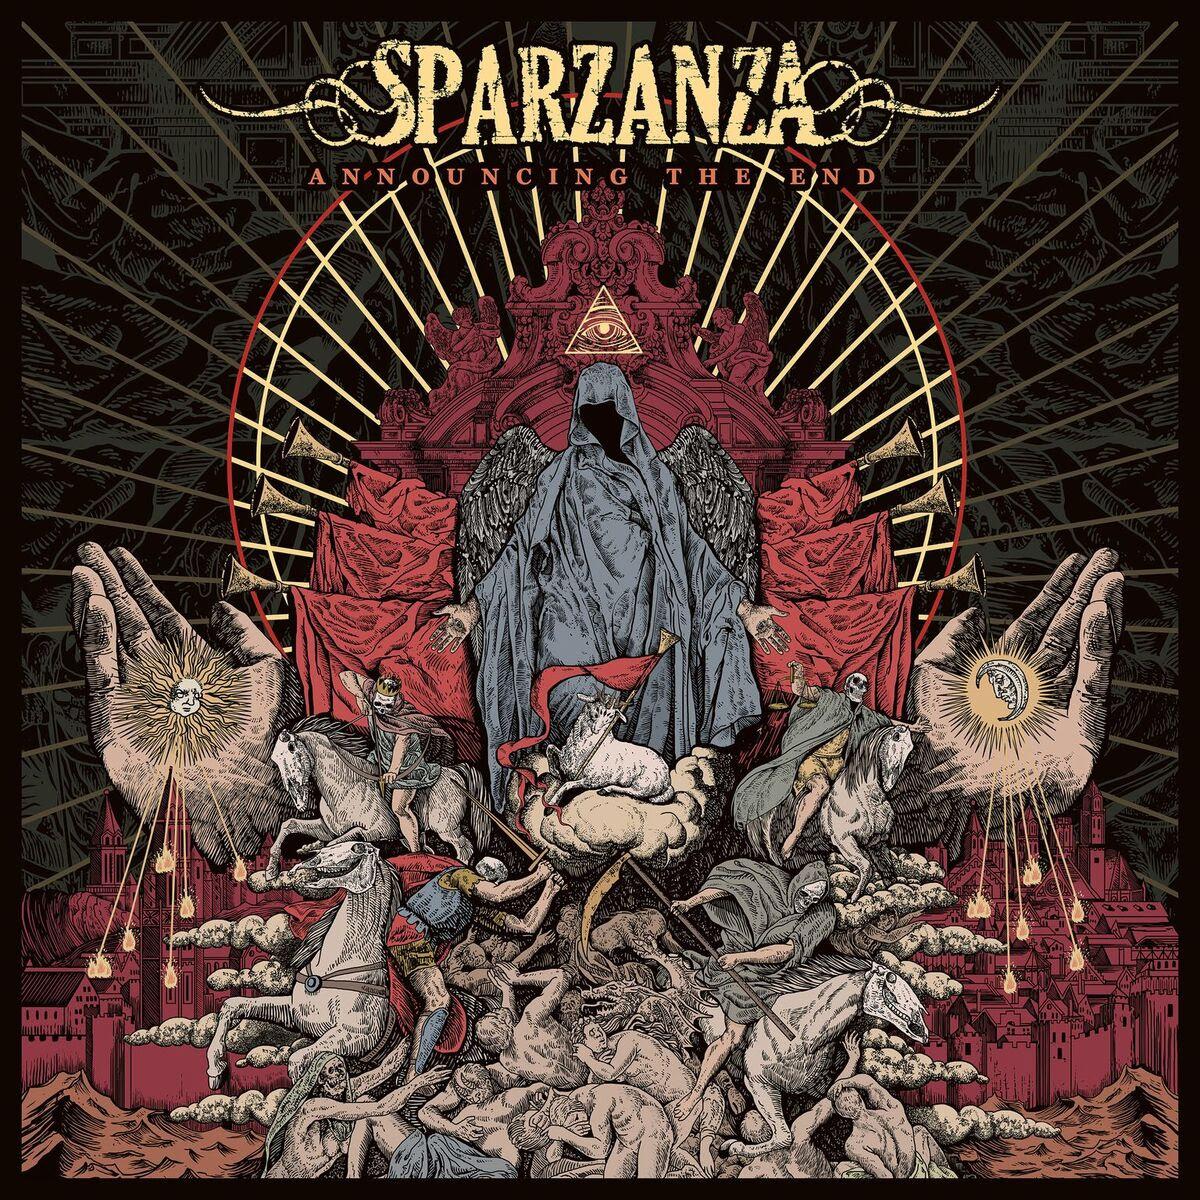 Sparzanza - Announcing The End - Album Cover